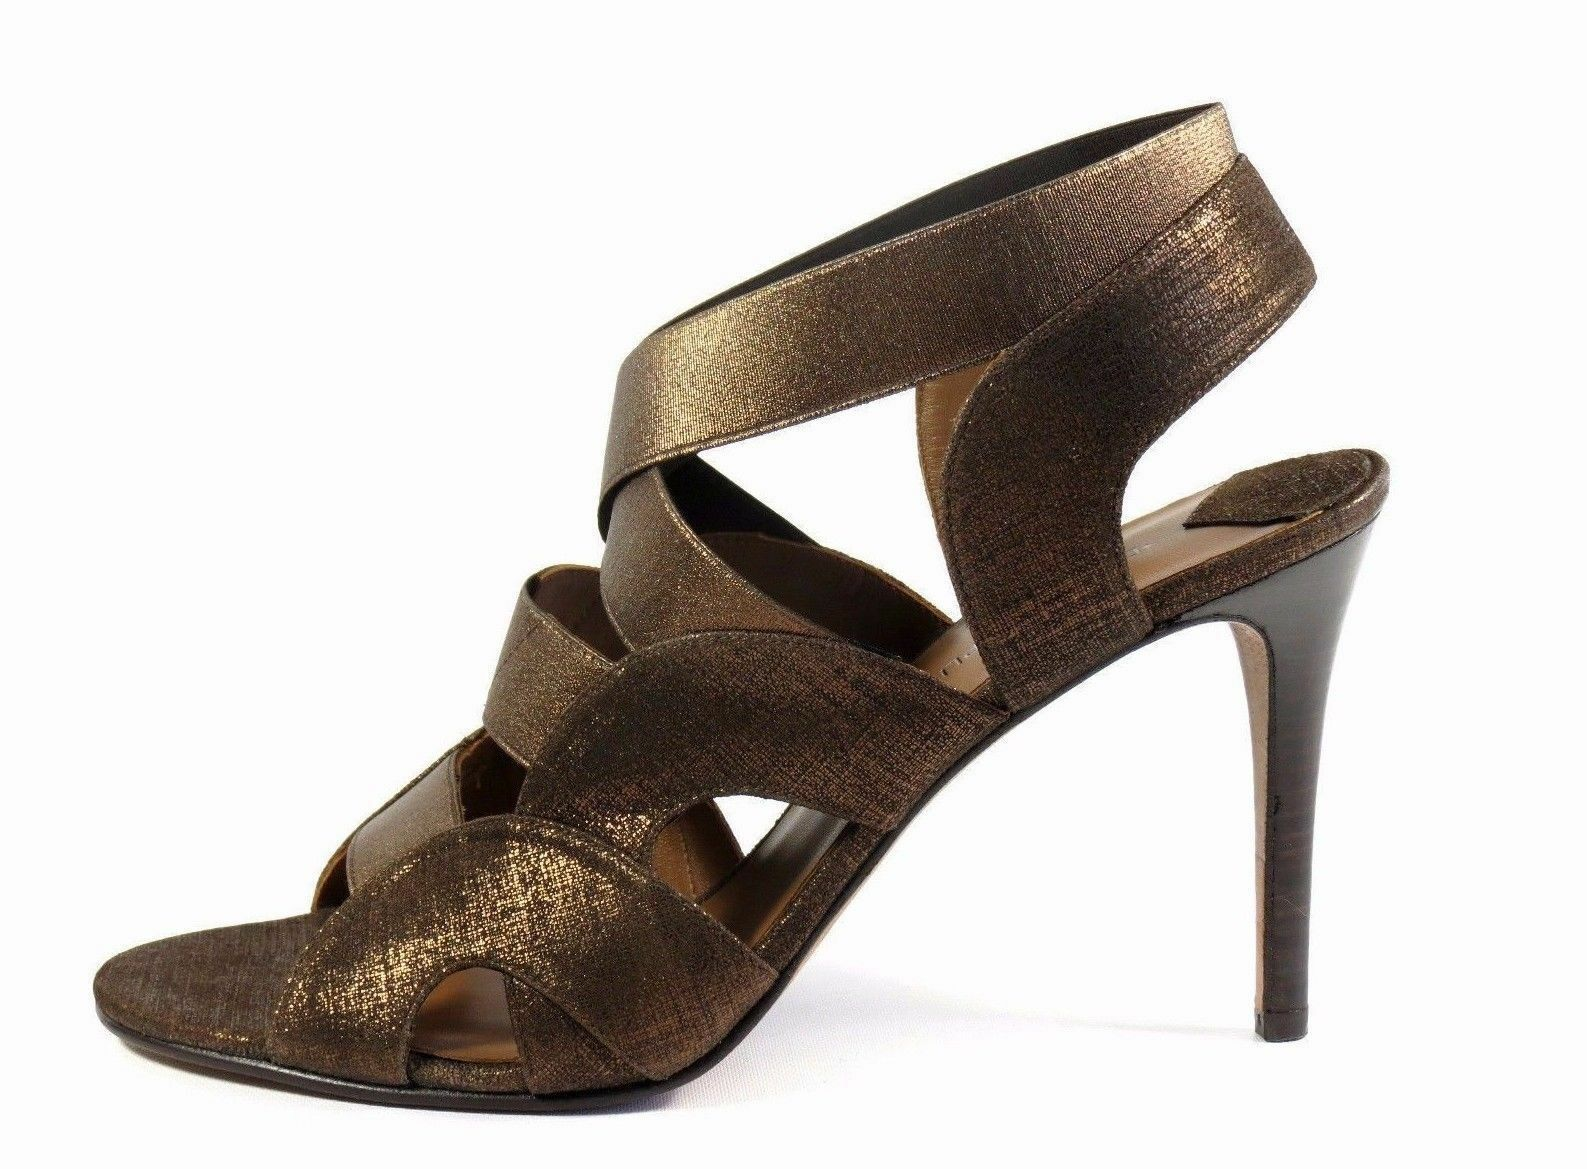 Donald Pliner Toe Milos Bronze Metallic Leder Elastic Strap Open Toe Pliner High Heel 7.5 e9fd85